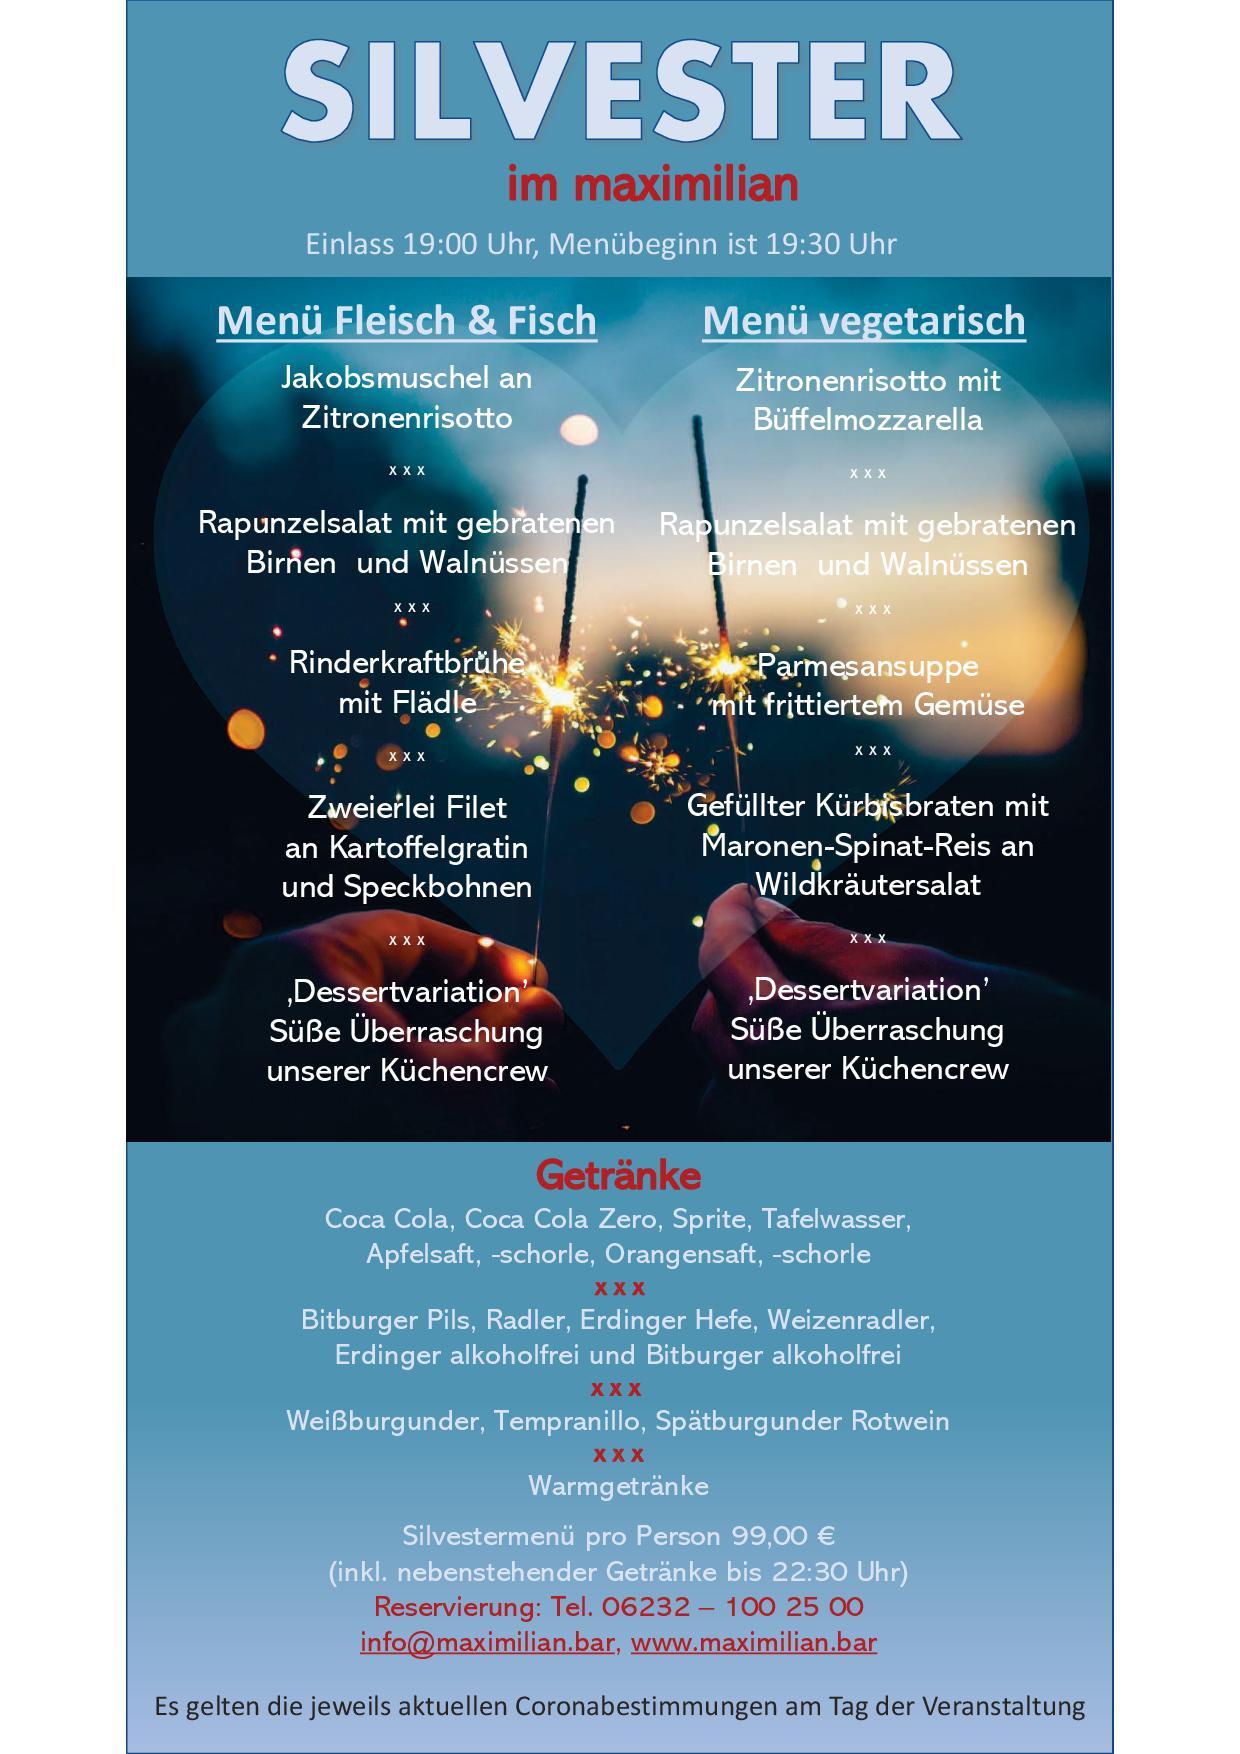 Silvester 2020 in Speyer